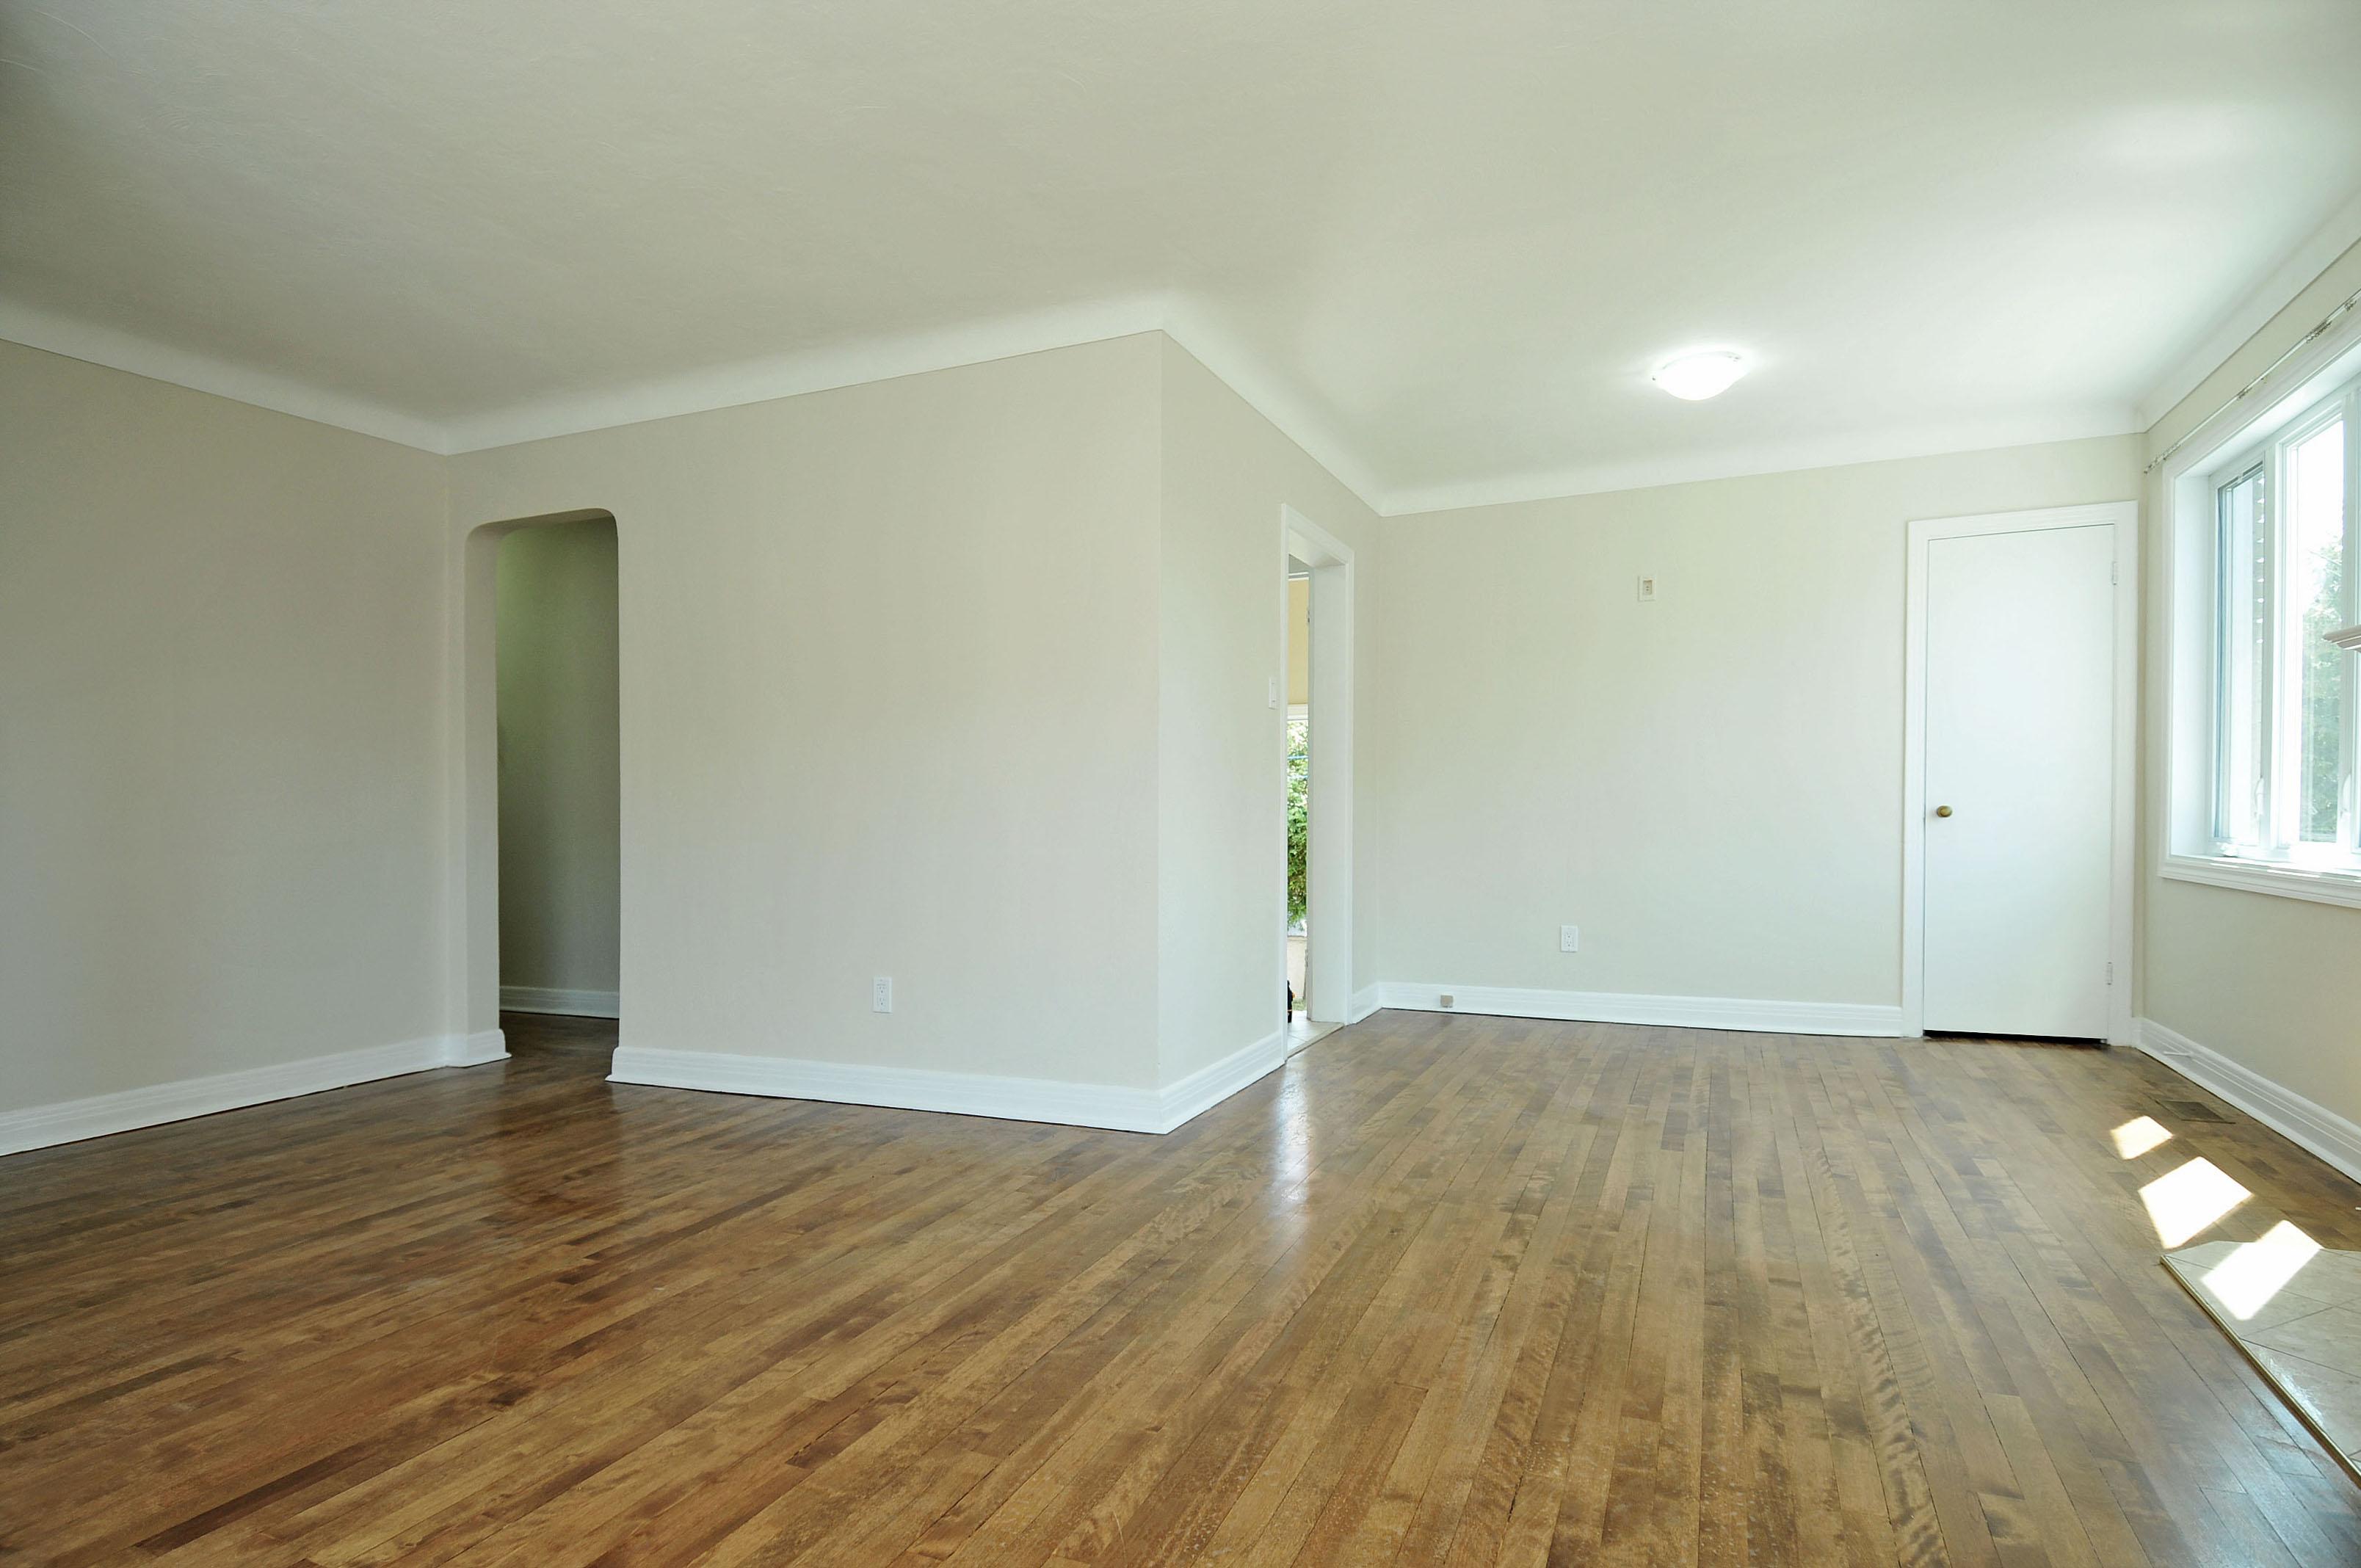 Billing bridge house dining room wood floors